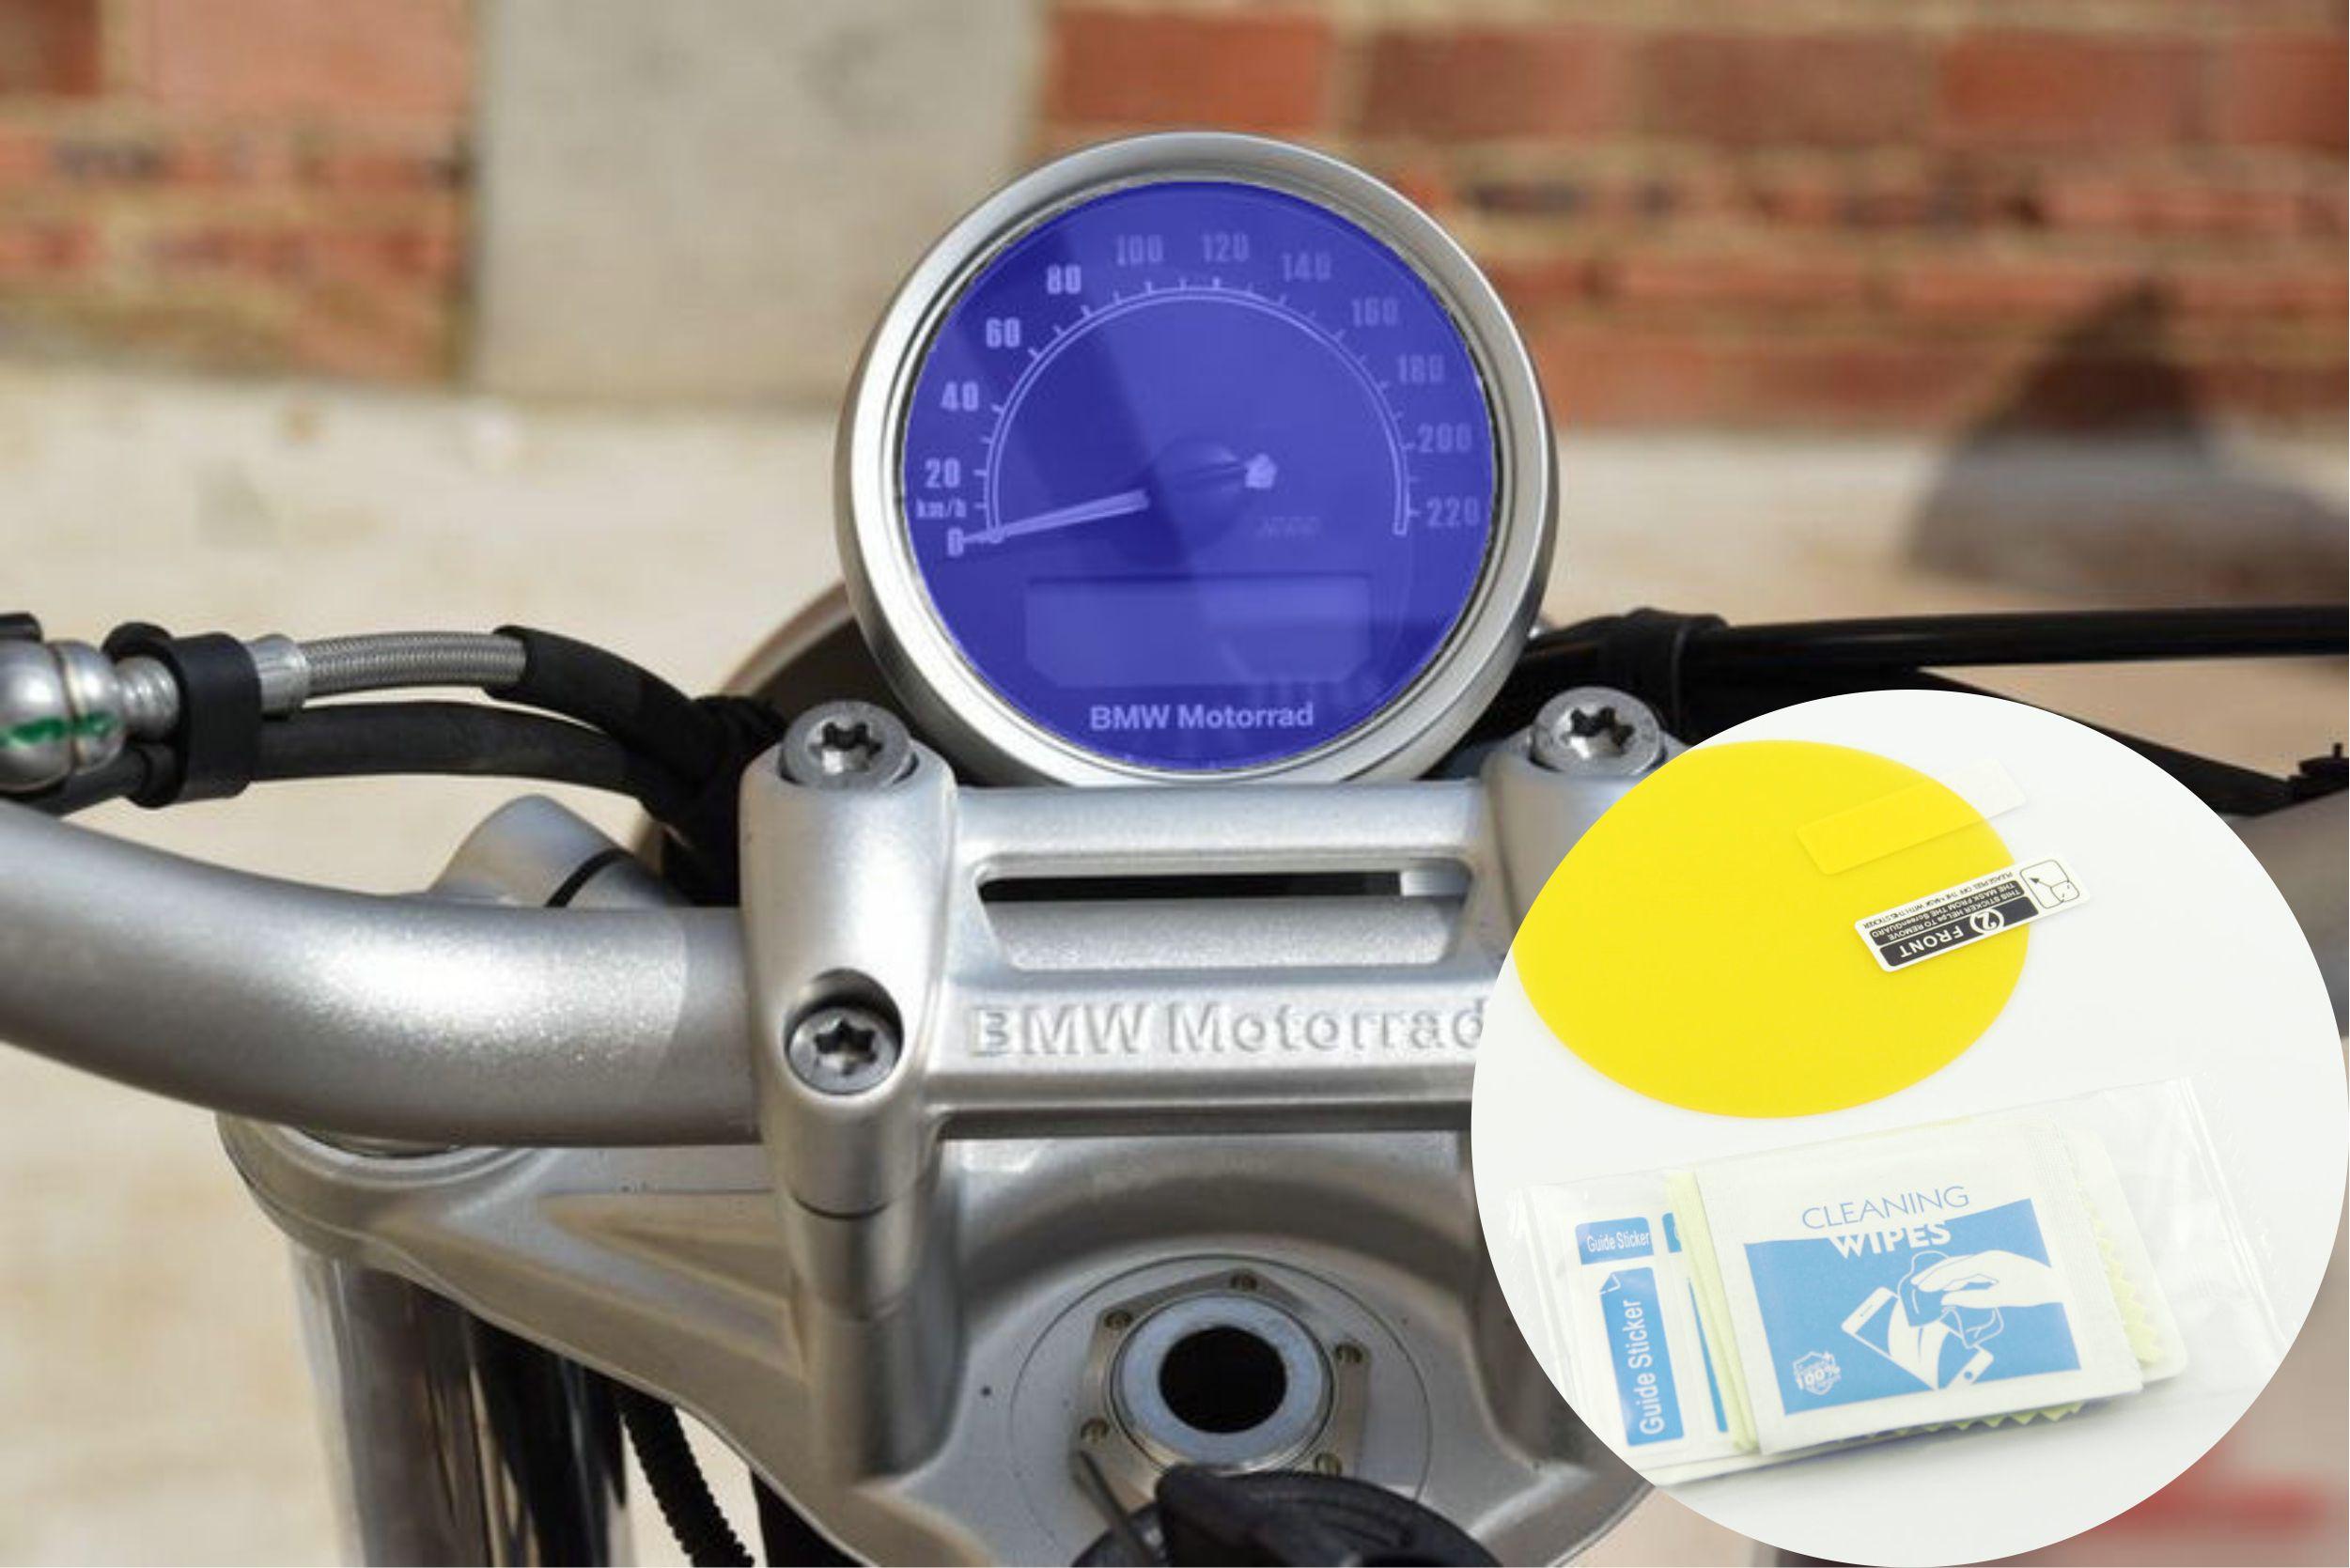 Tablero de instrumentos de protección contra arañazos, Protector de pantalla de velocímetro, pegatinas protectoras para BMW R NINE T SCRAMBLER 2016-2017